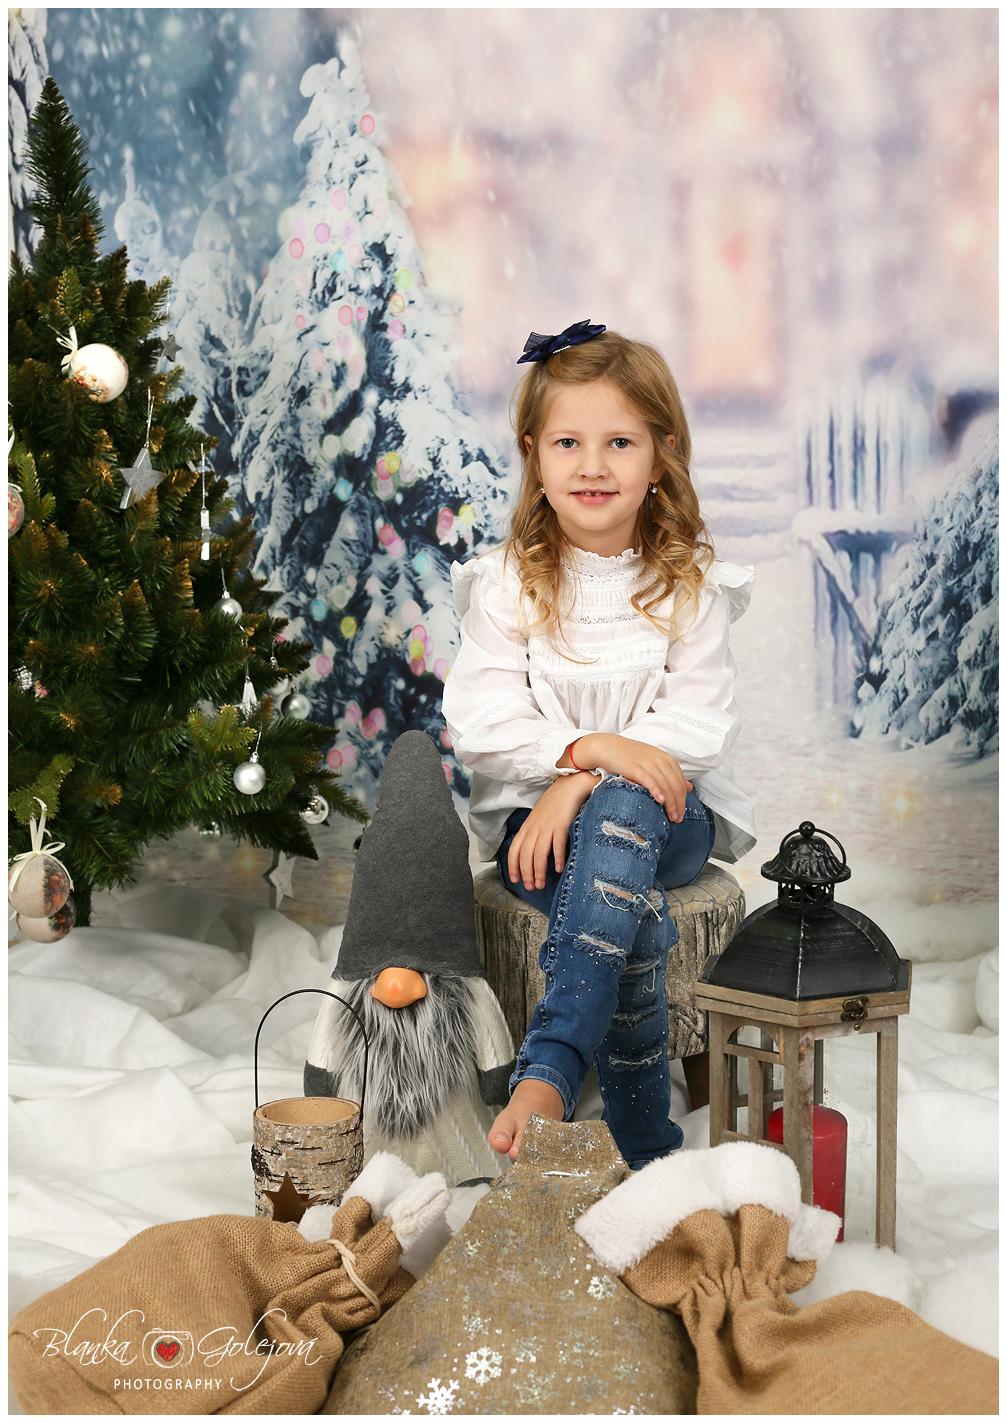 Vianocna pohladnica